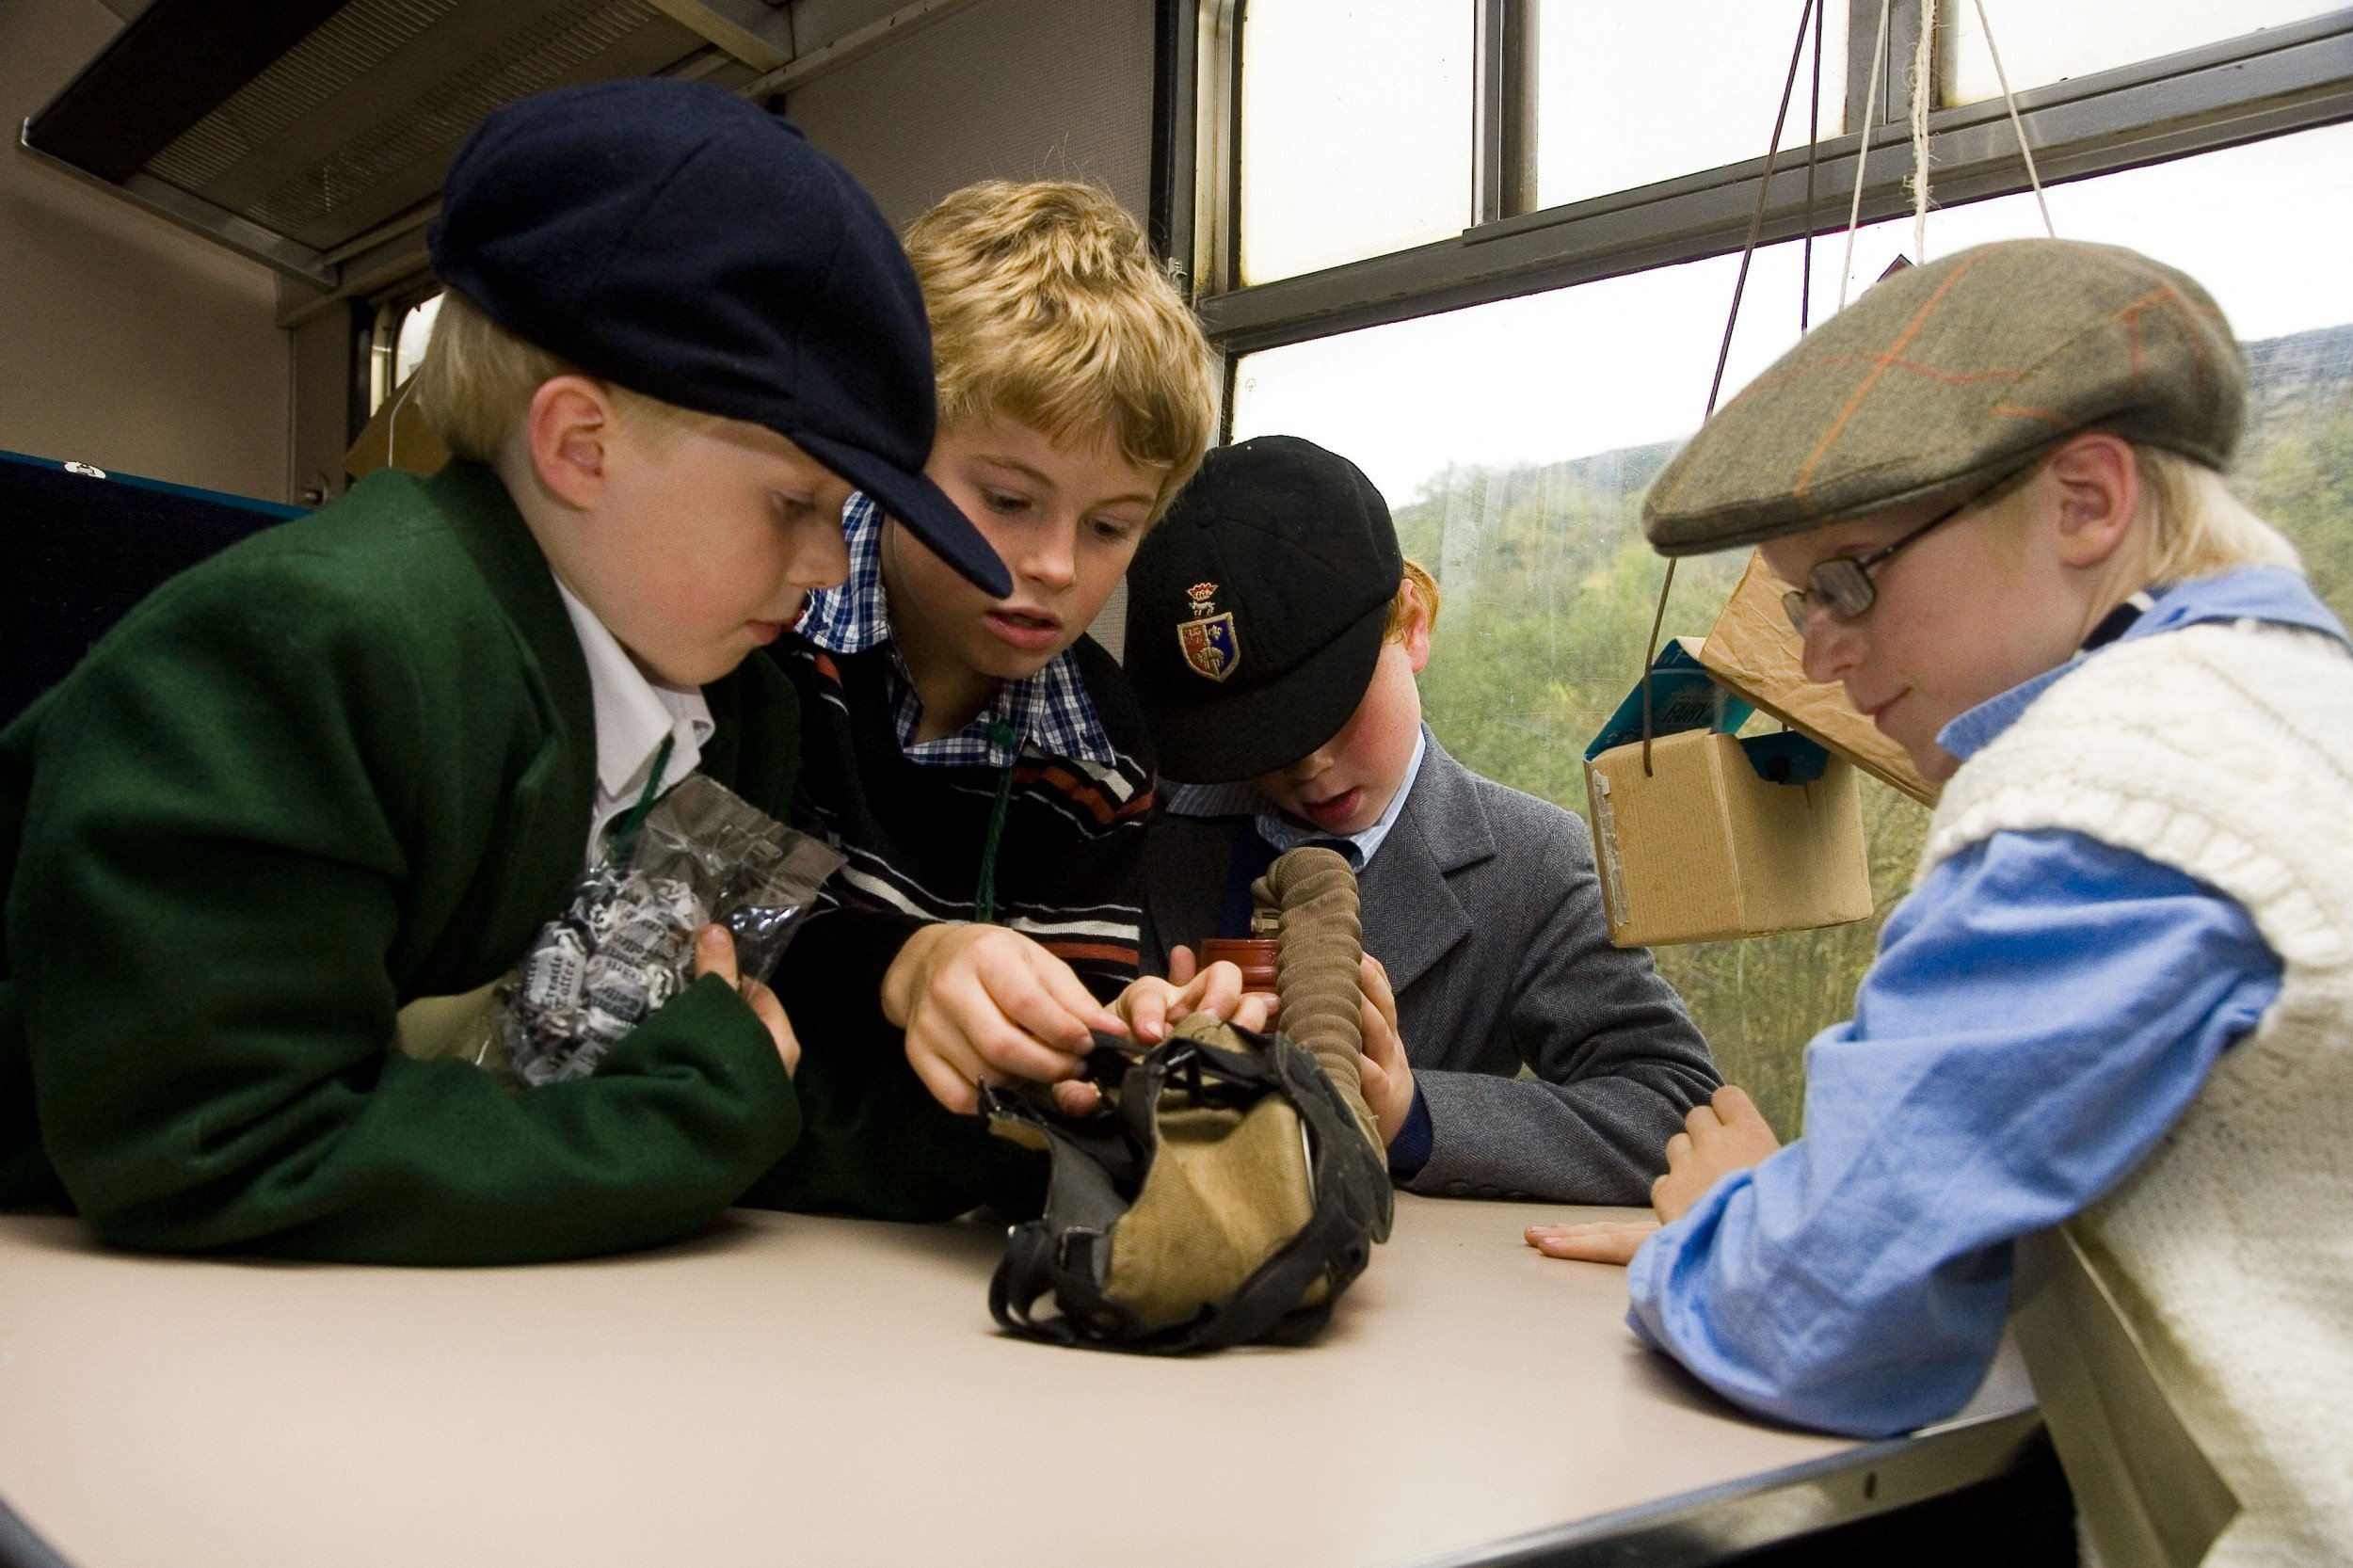 North Yorkshire Moors Railway 7